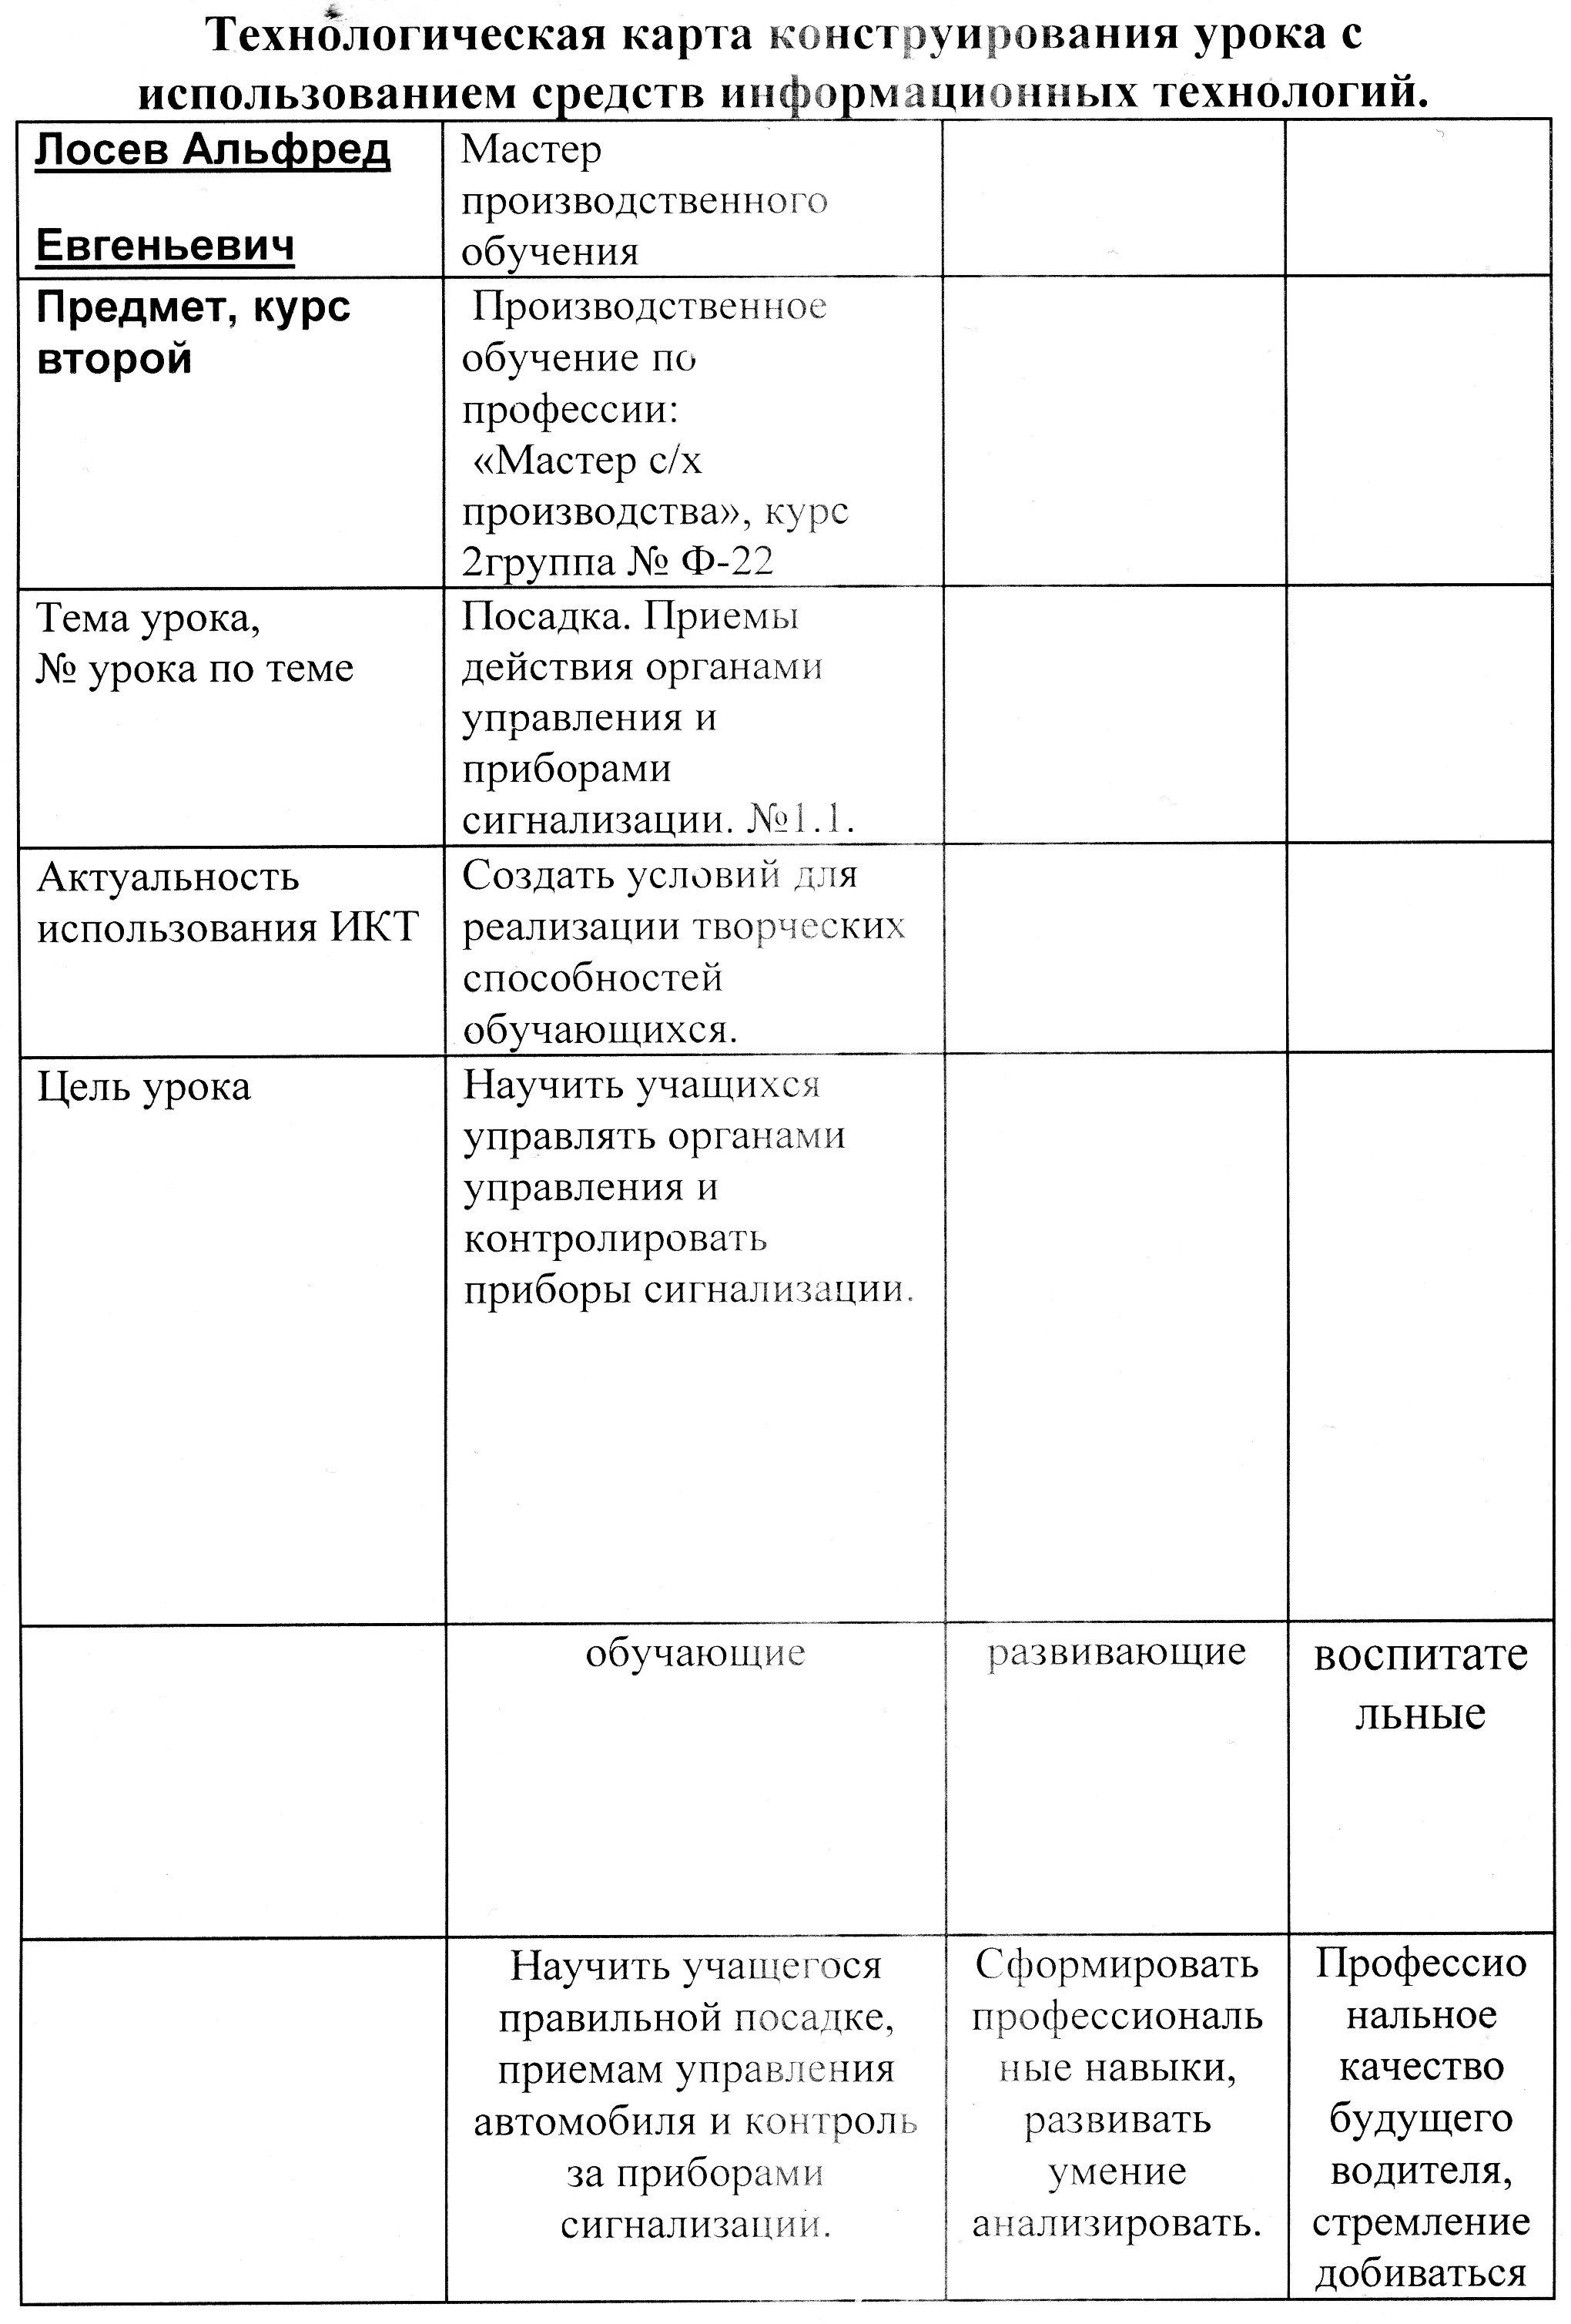 C:\Users\Василий Мельченко\Pictures\img623.jpg